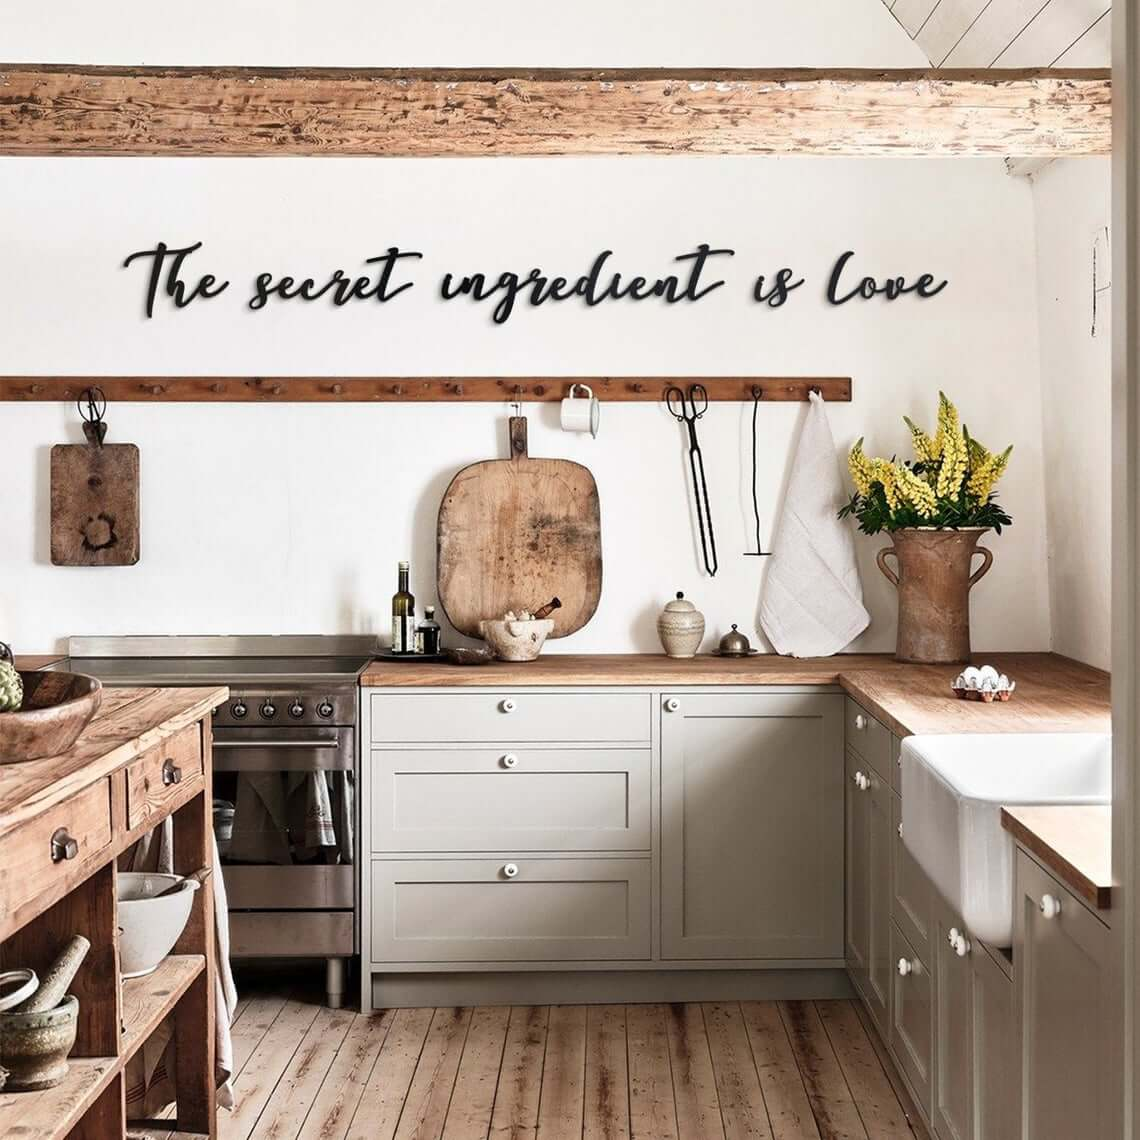 Scripted Secret Ingredient Kitchen Wall Art